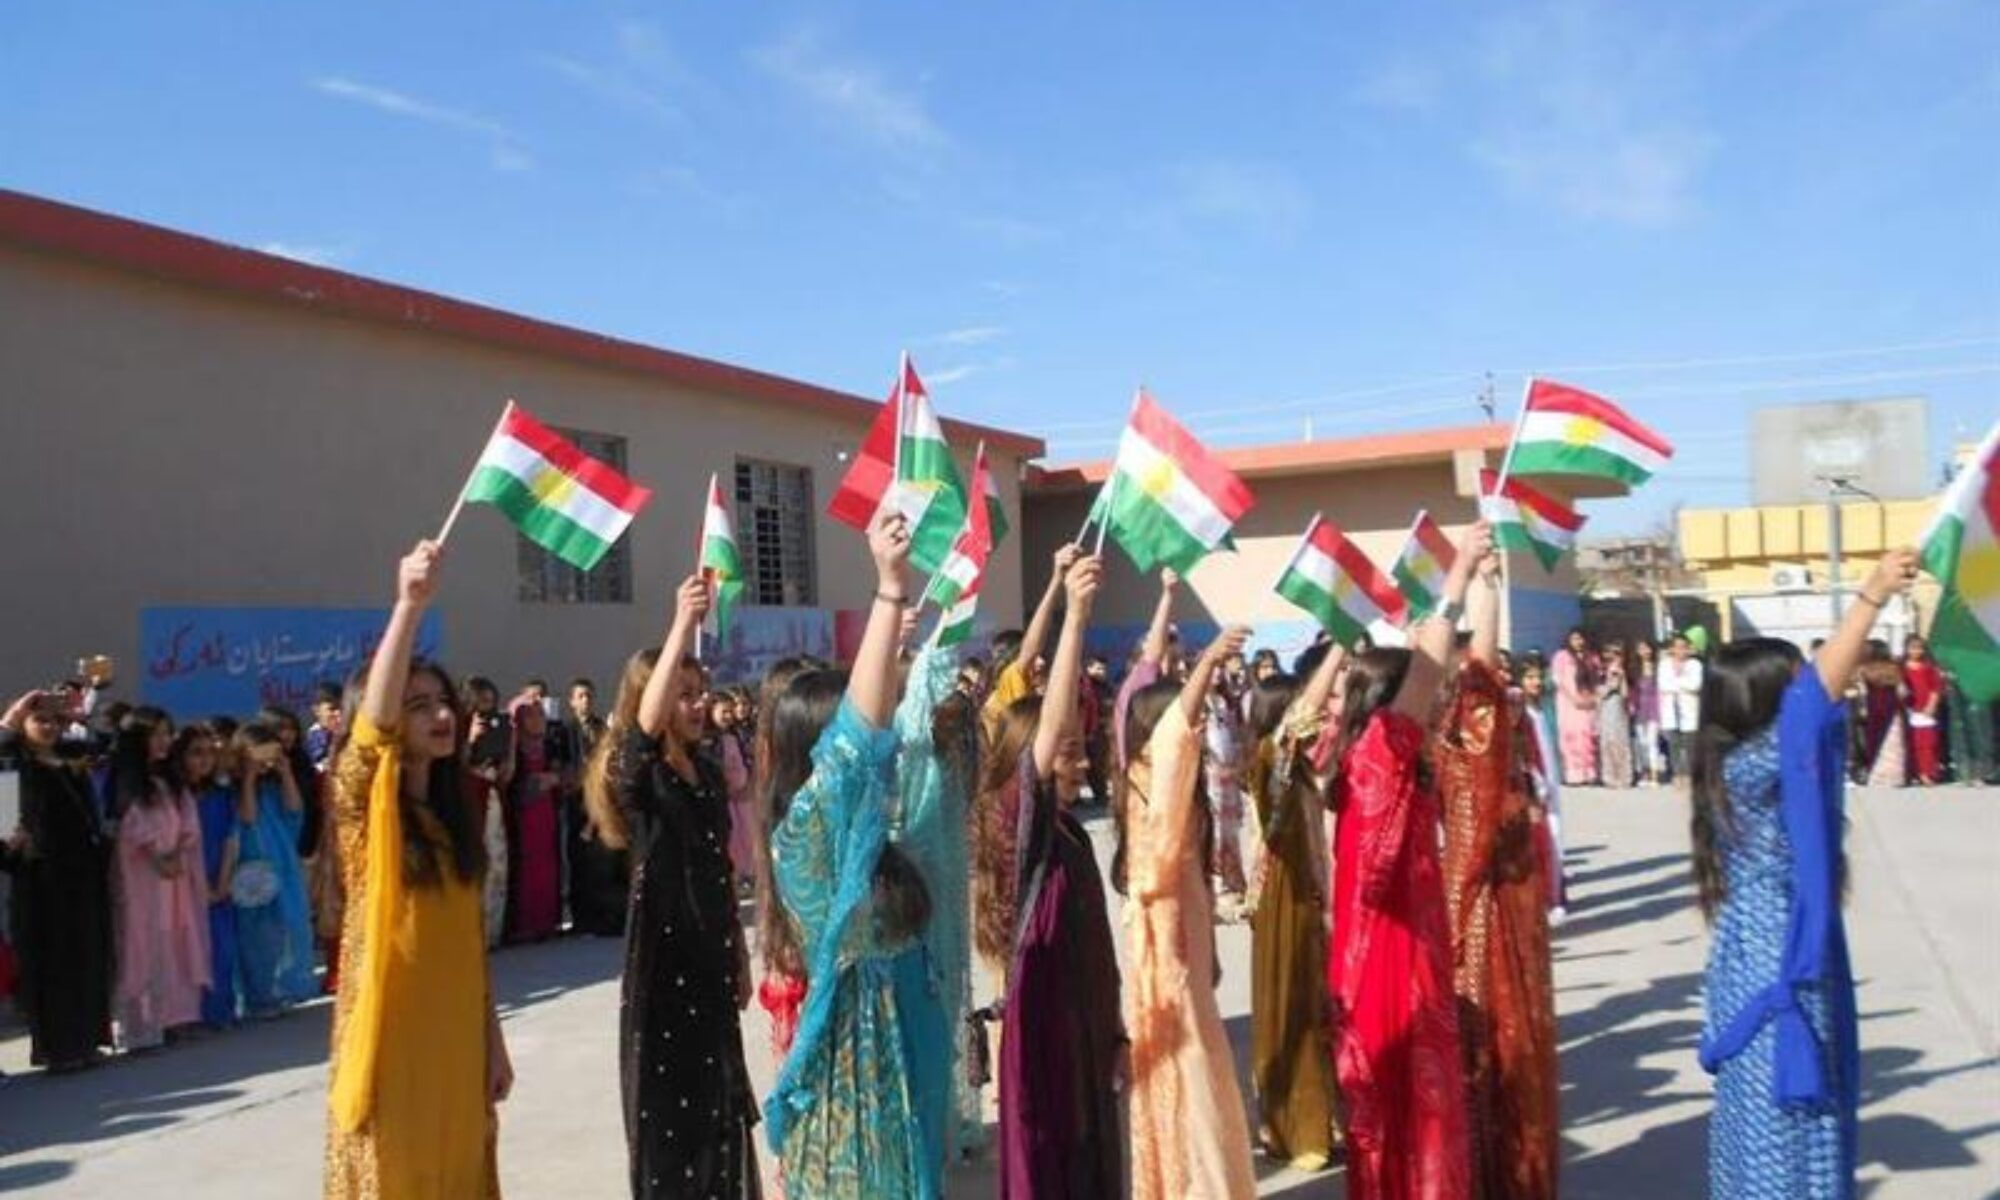 Bugün 10 Mart Kürt Ulusal Kıyafet Günü